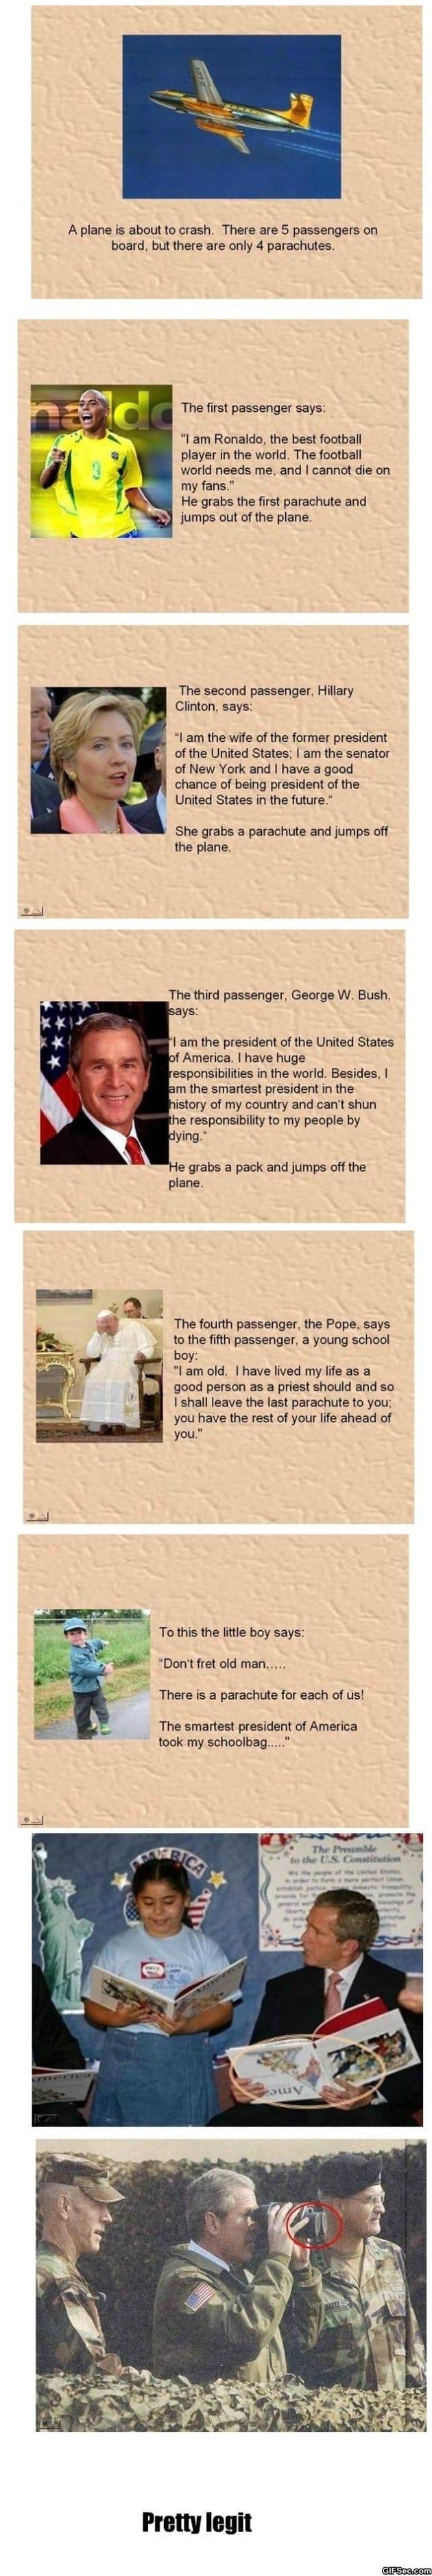 the-smartest-president